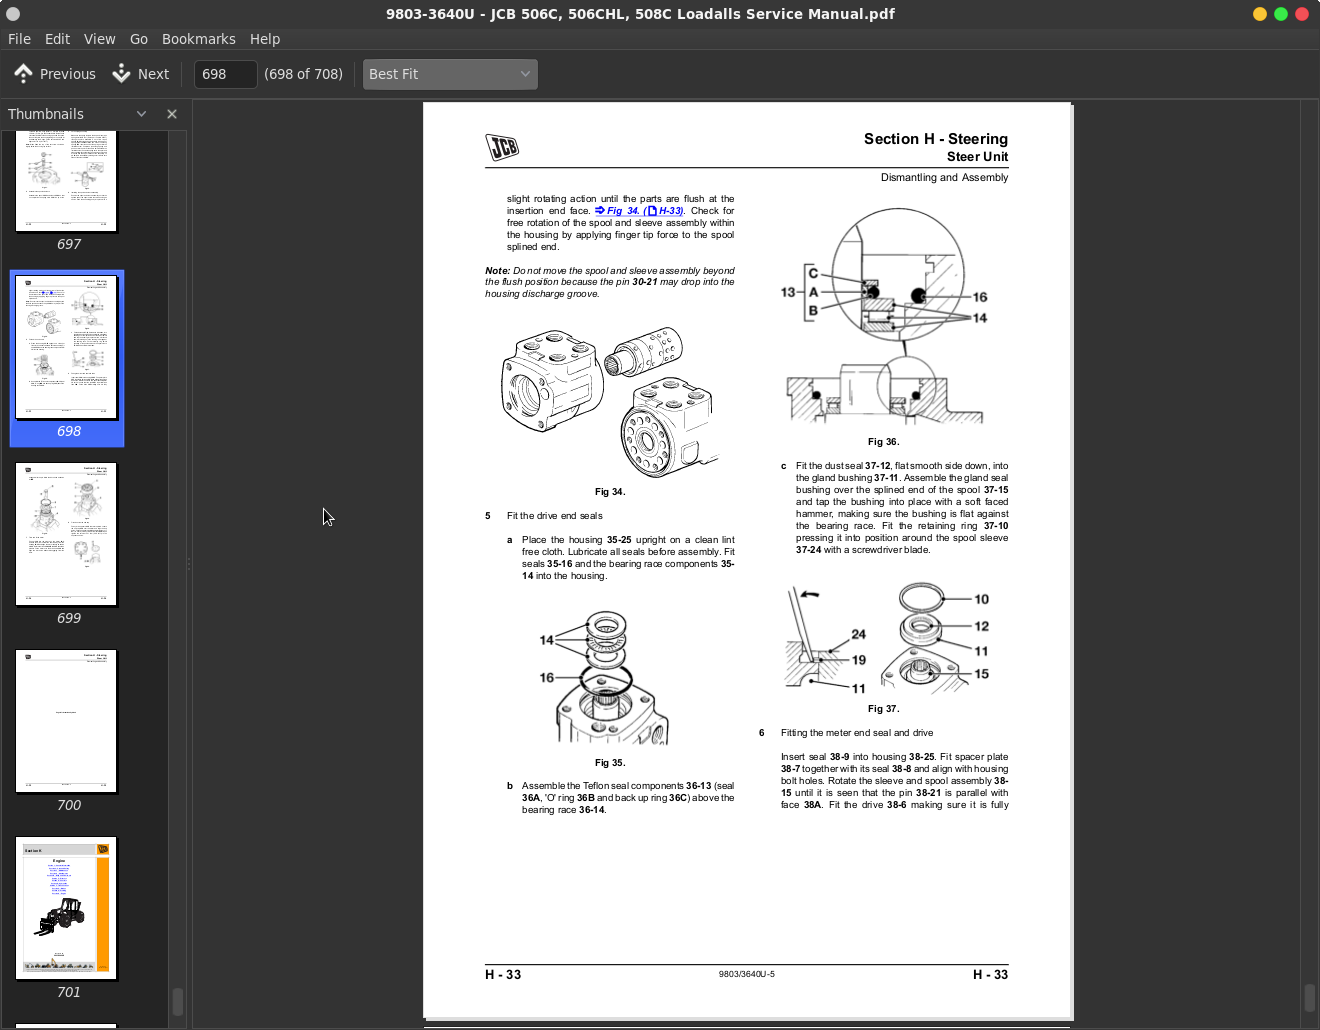 Jcb Loadalls 506c  506chl  508c Repair  U0026 Service Manuals